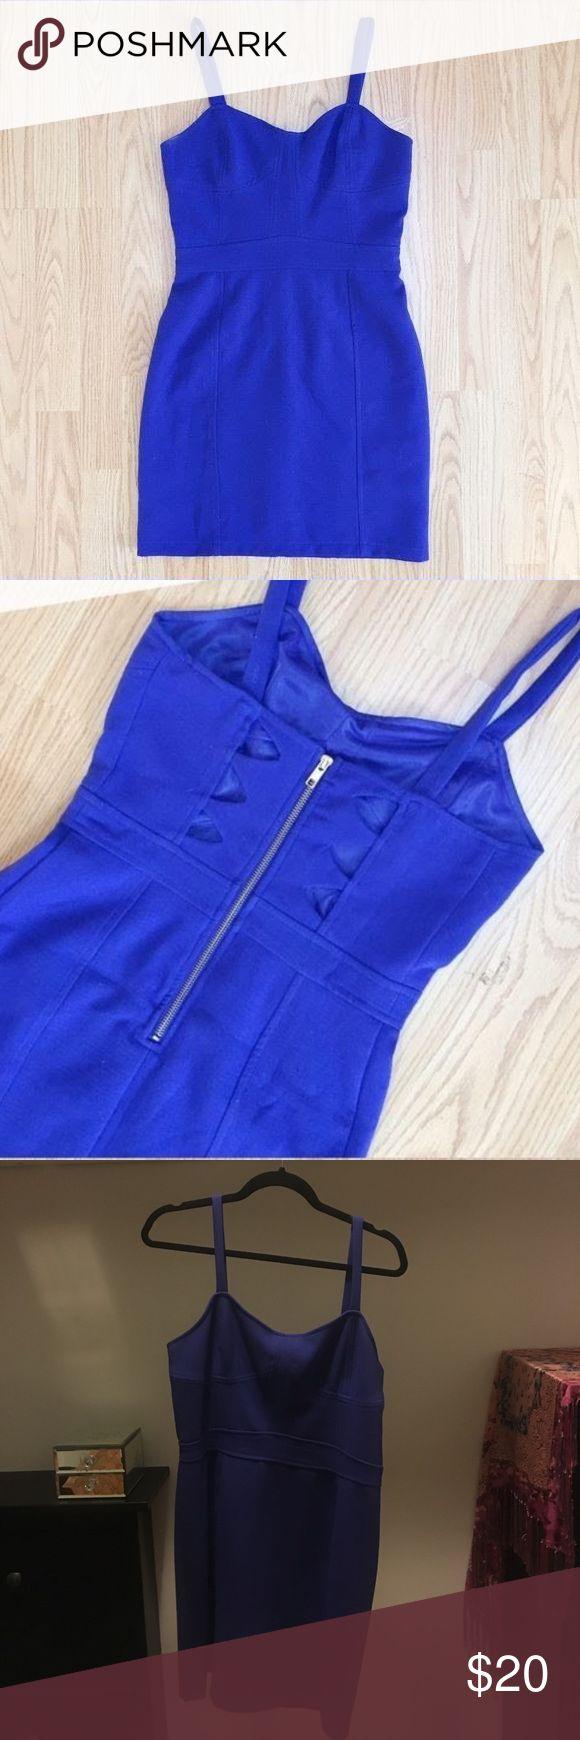 SALE Sparkle & Fade Cobalt Bodycon Dress SALESparkle & Fade Cobalt Bodycon Dress Gorgeous bright blue dress with subtle back Urban Outfitters Dresses Mini